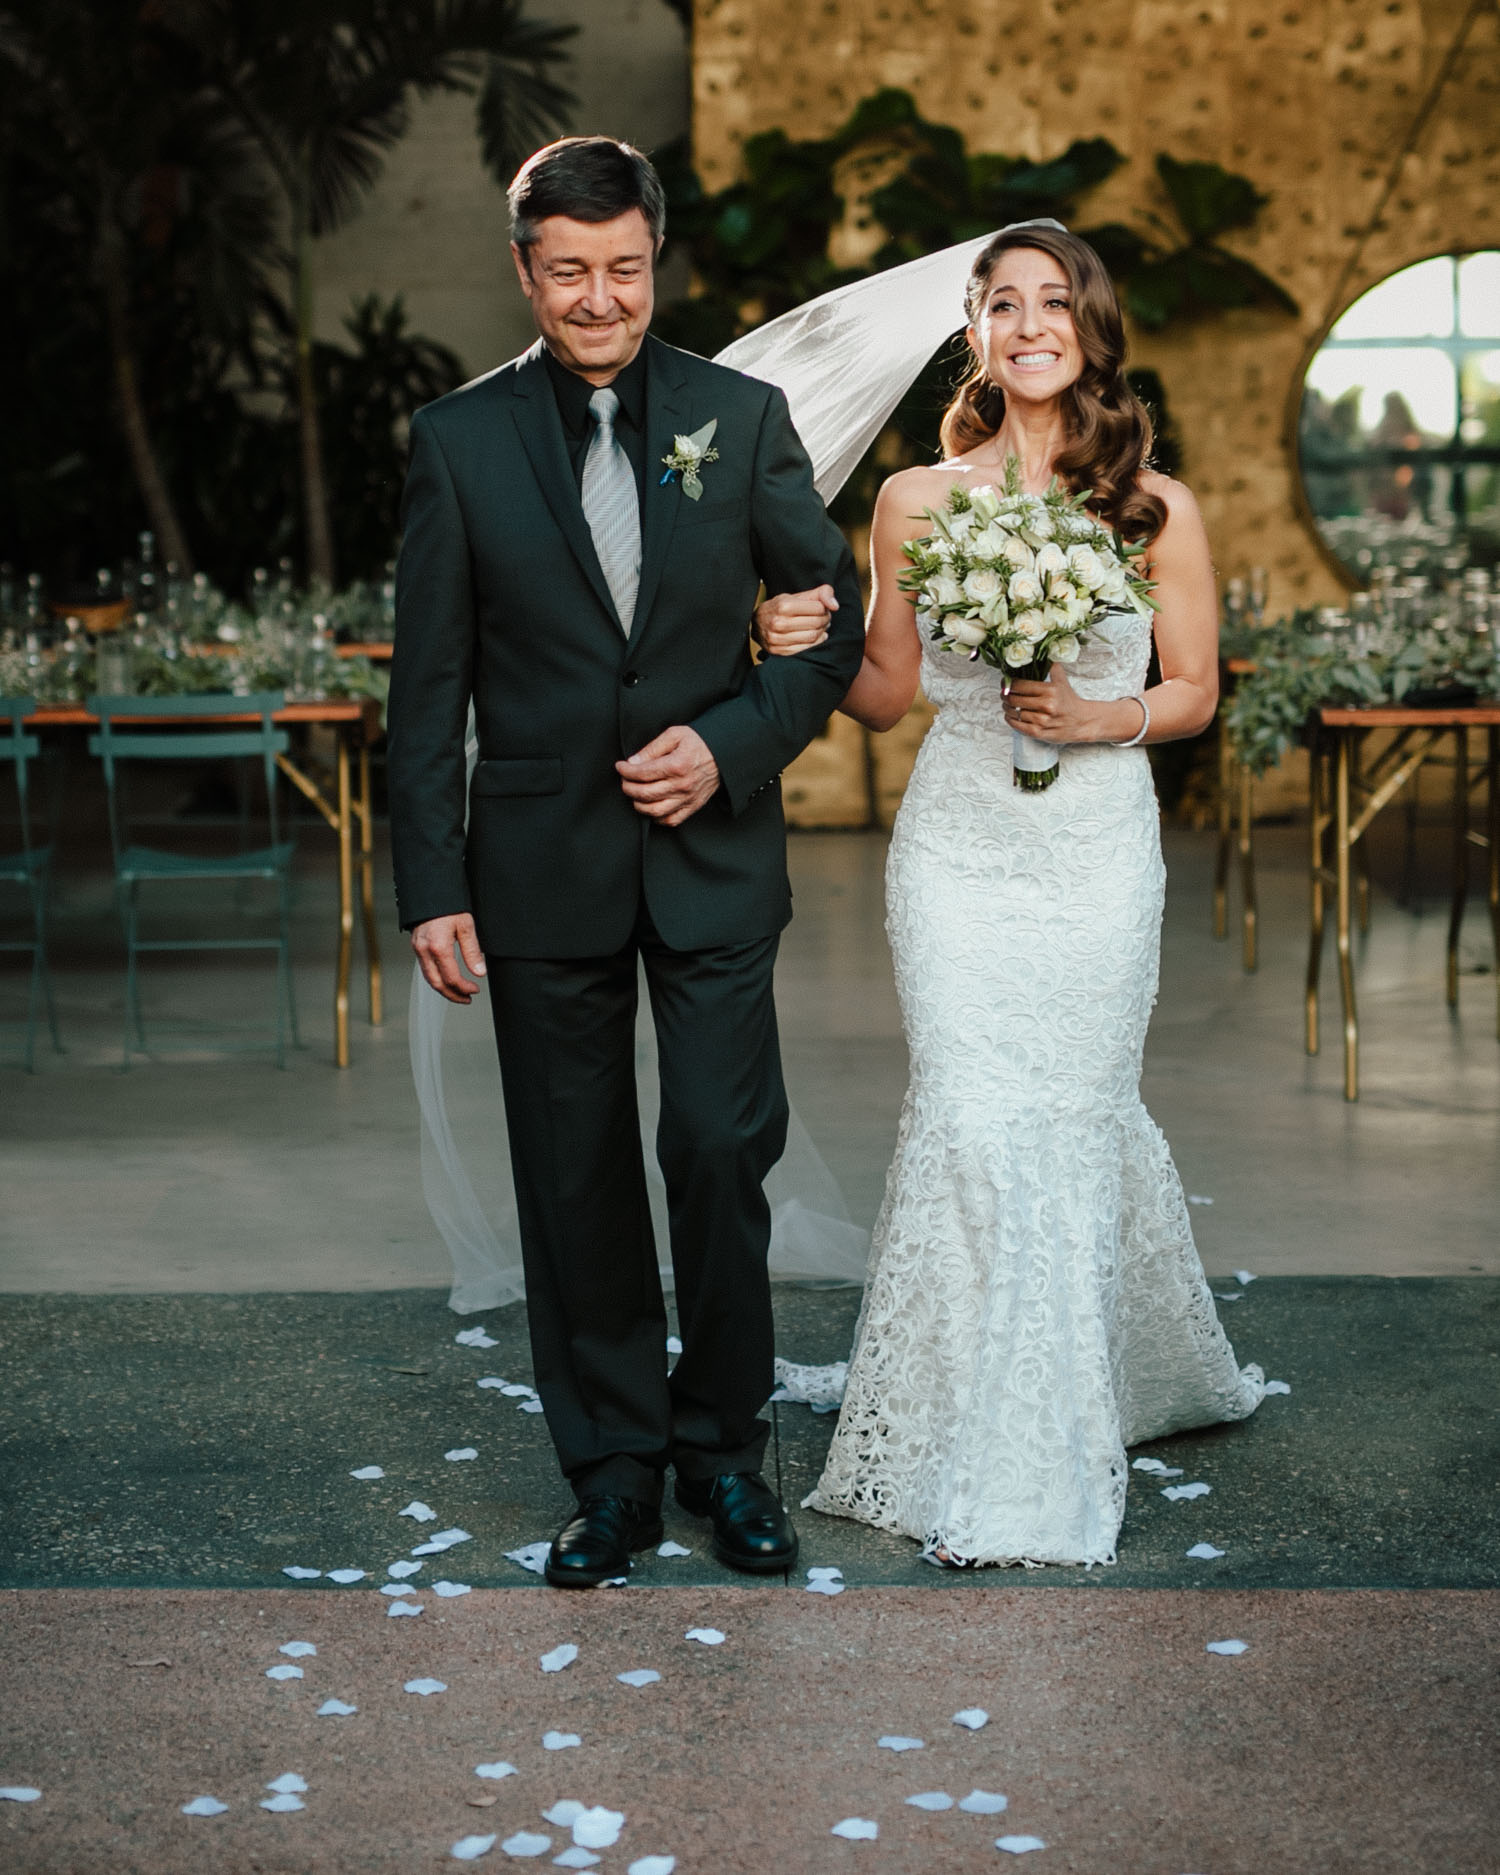 Los+Angeles+Wedding+Photographer,+Ace+Hotel,+Millwick+Wedding+-+The+Gathering+Season+x+weareleoandkat+059.jpeg